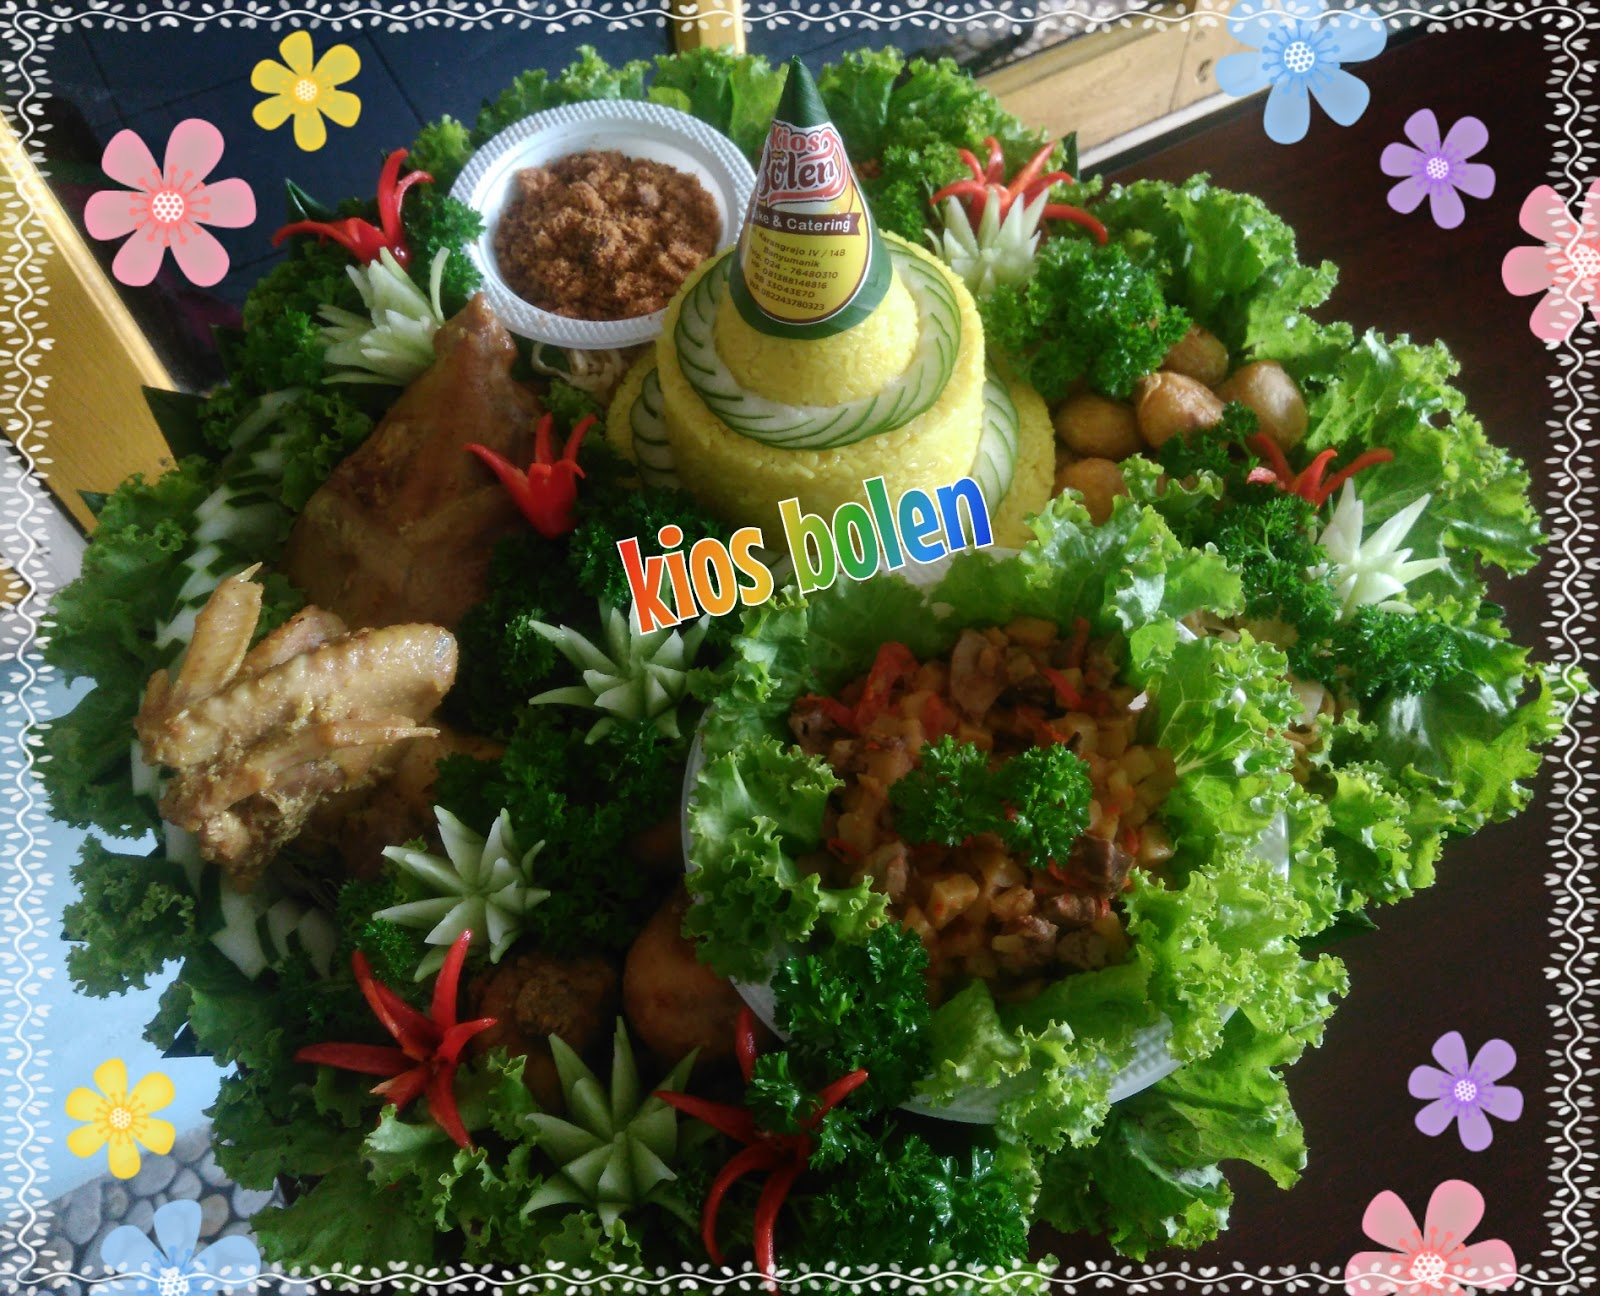 Kios Bolen Semarang Tumpeng Nasi Kuning Ingkung